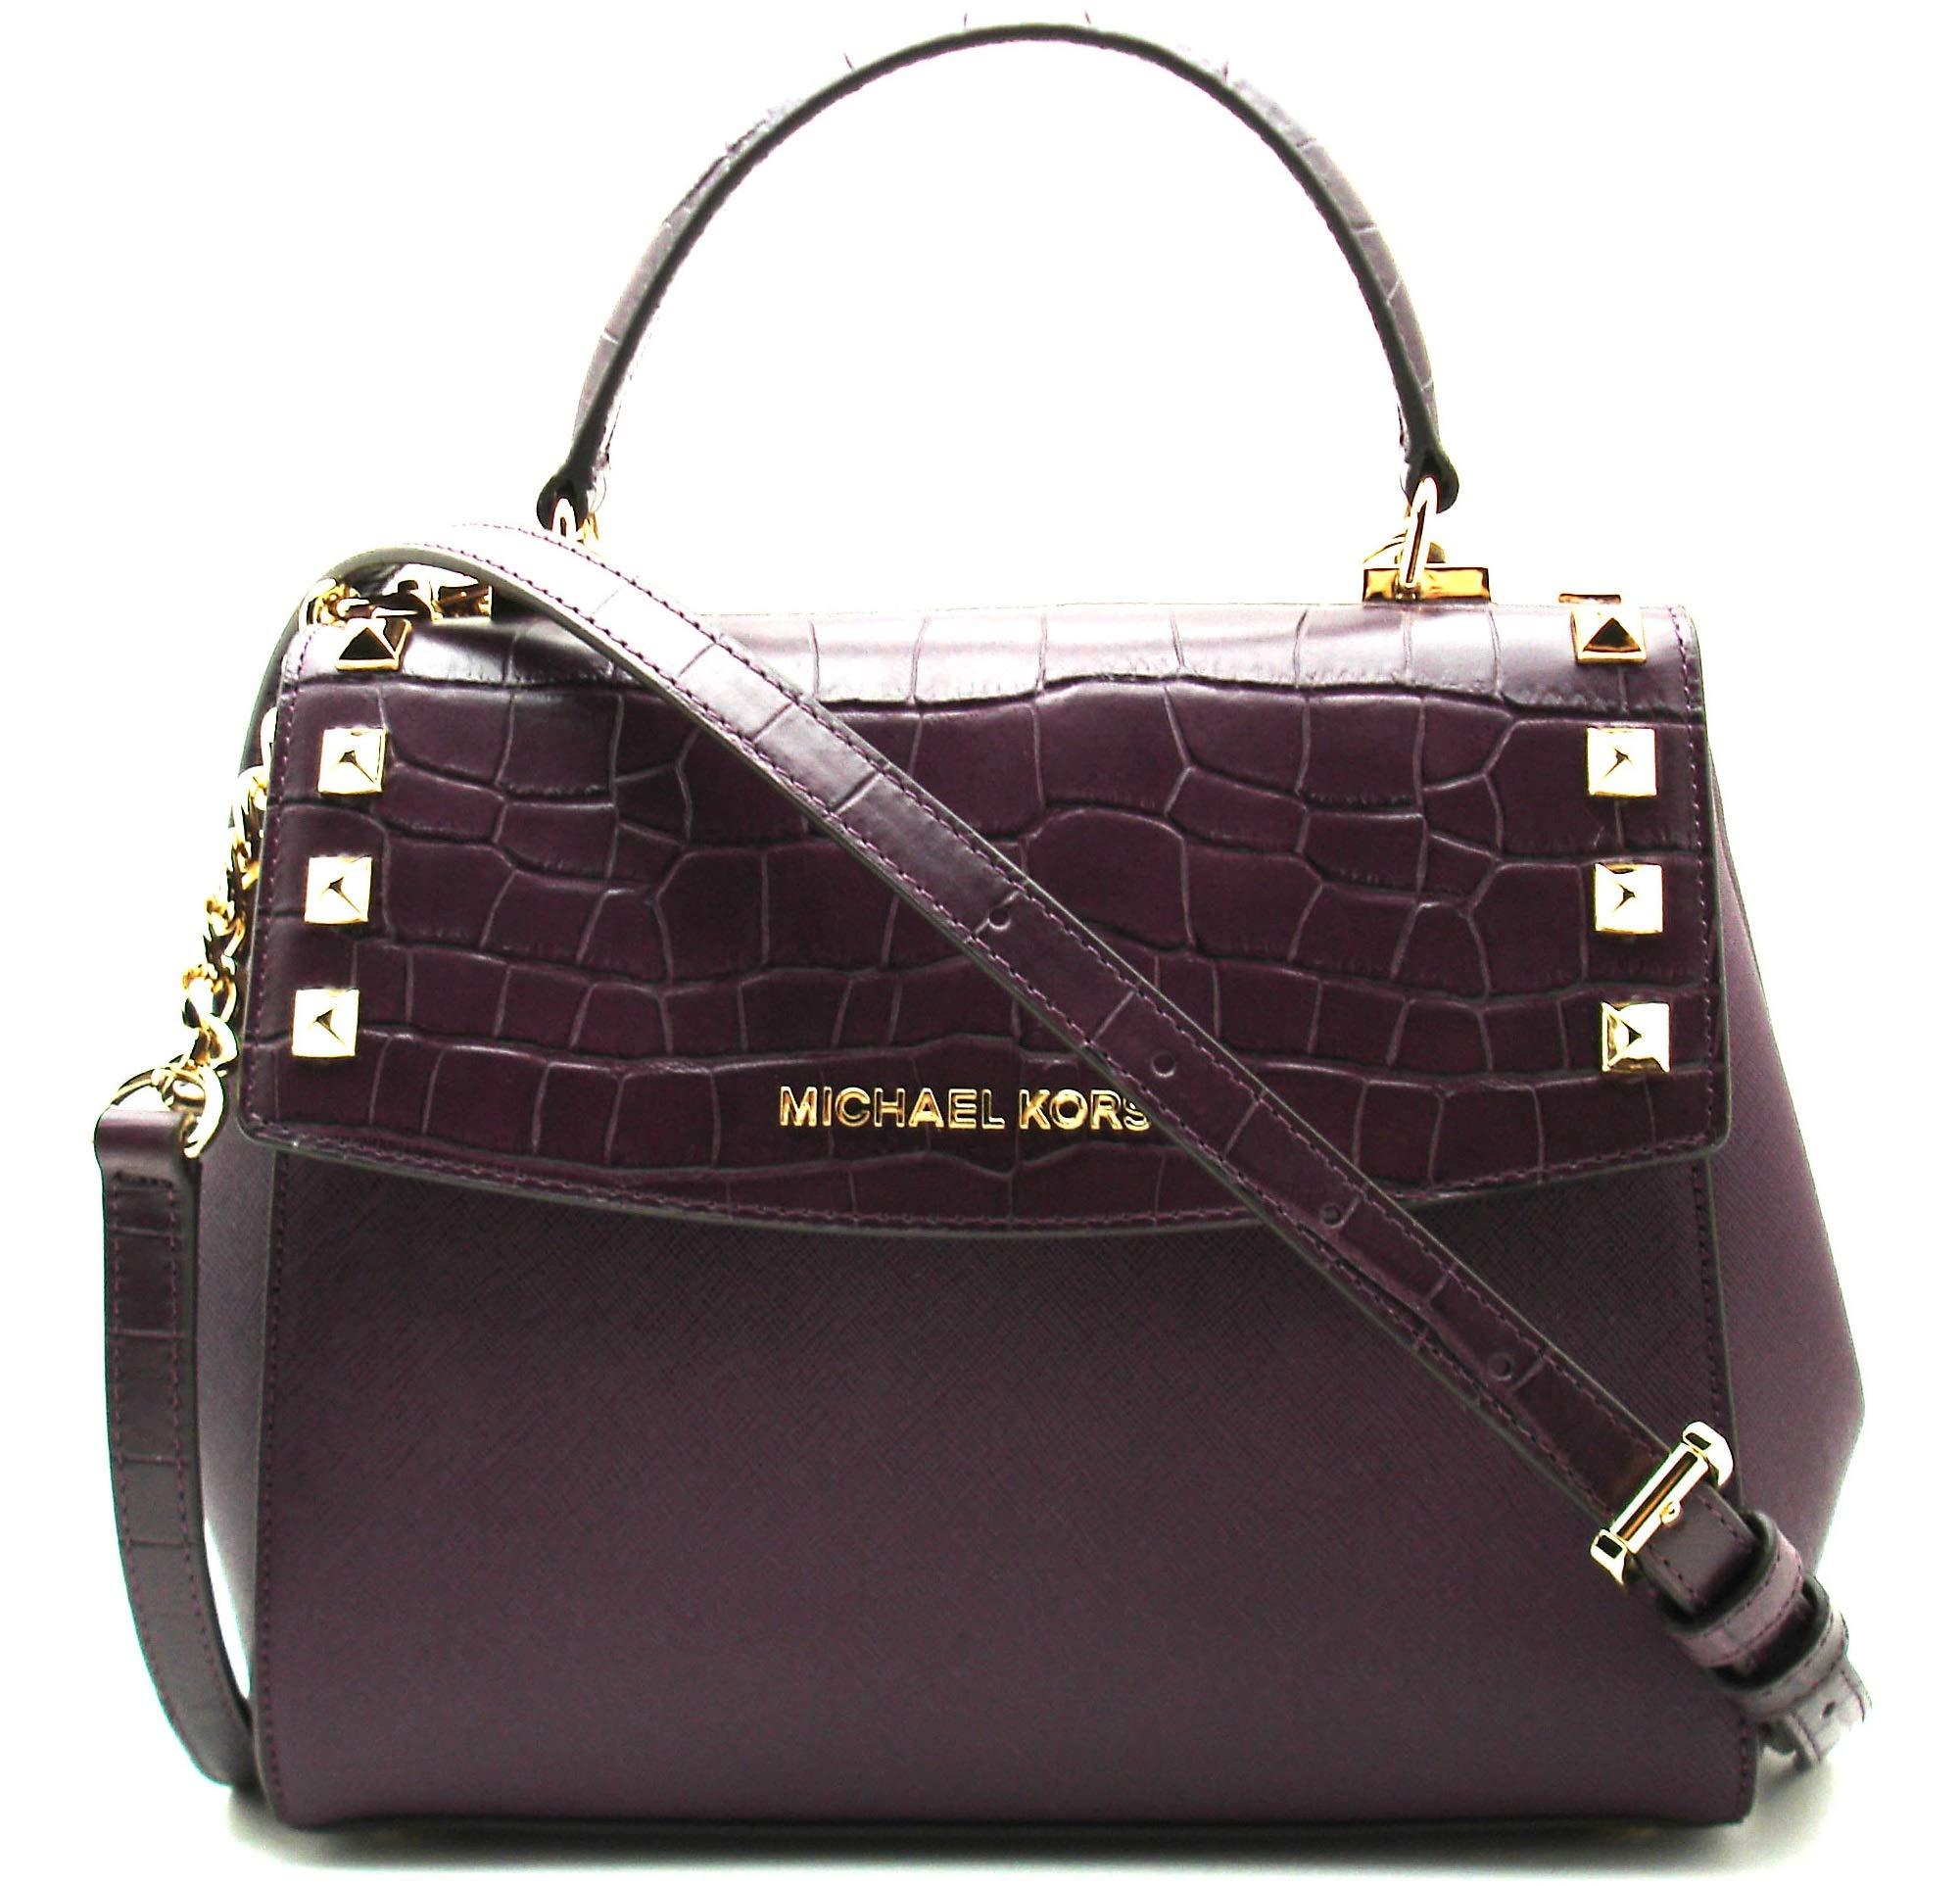 Michael Kors Karla Women's Medium Leather Satchel Crossbody Bag Purse Handbag (Damson)